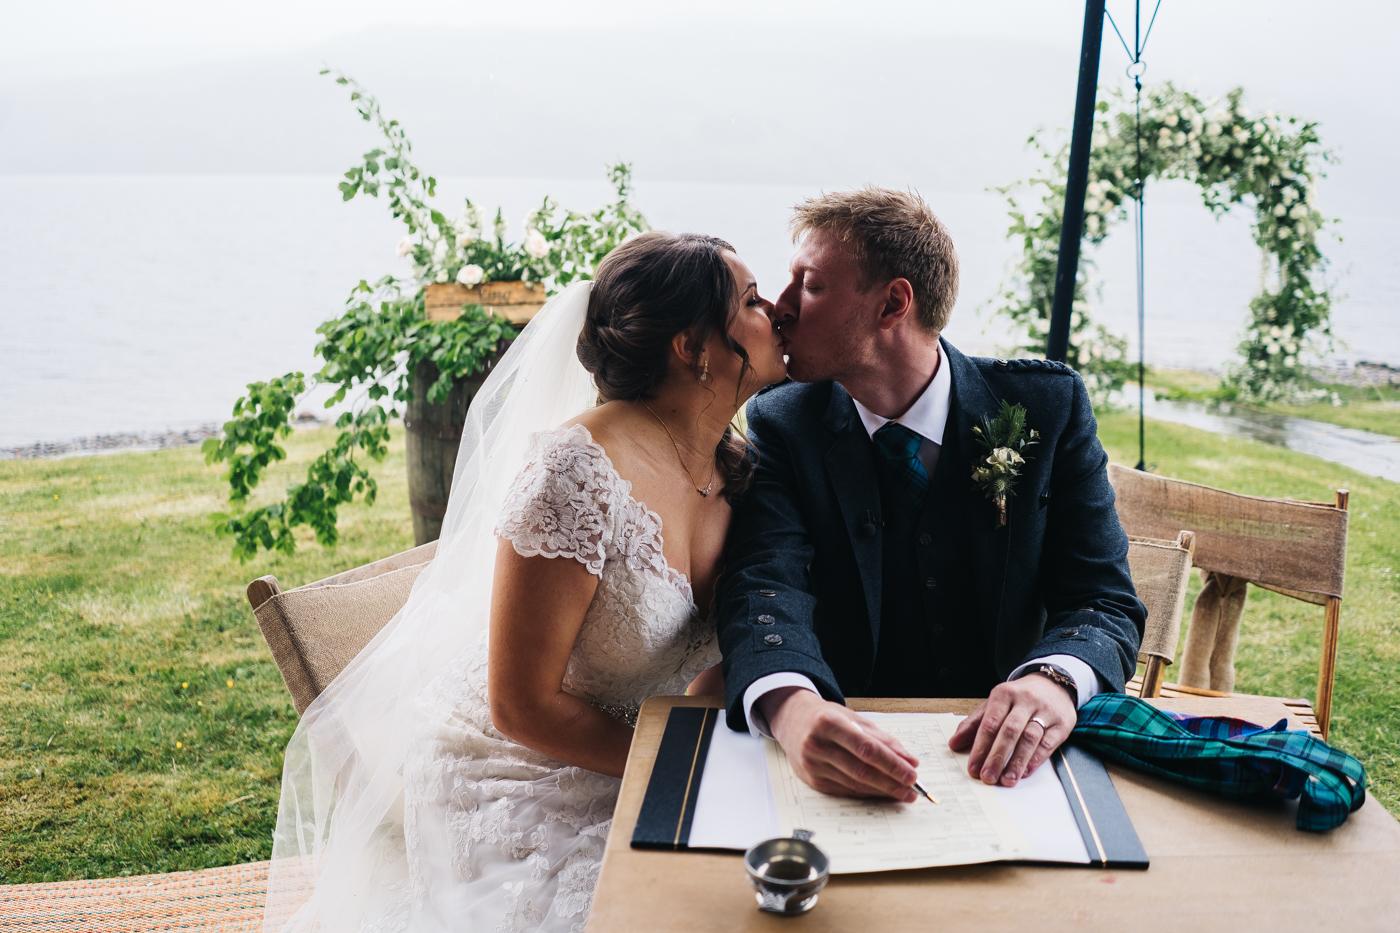 scottish-wedding-trossachs-loch-tay-highlannds-relaxed-photography-photographer-0024.jpg